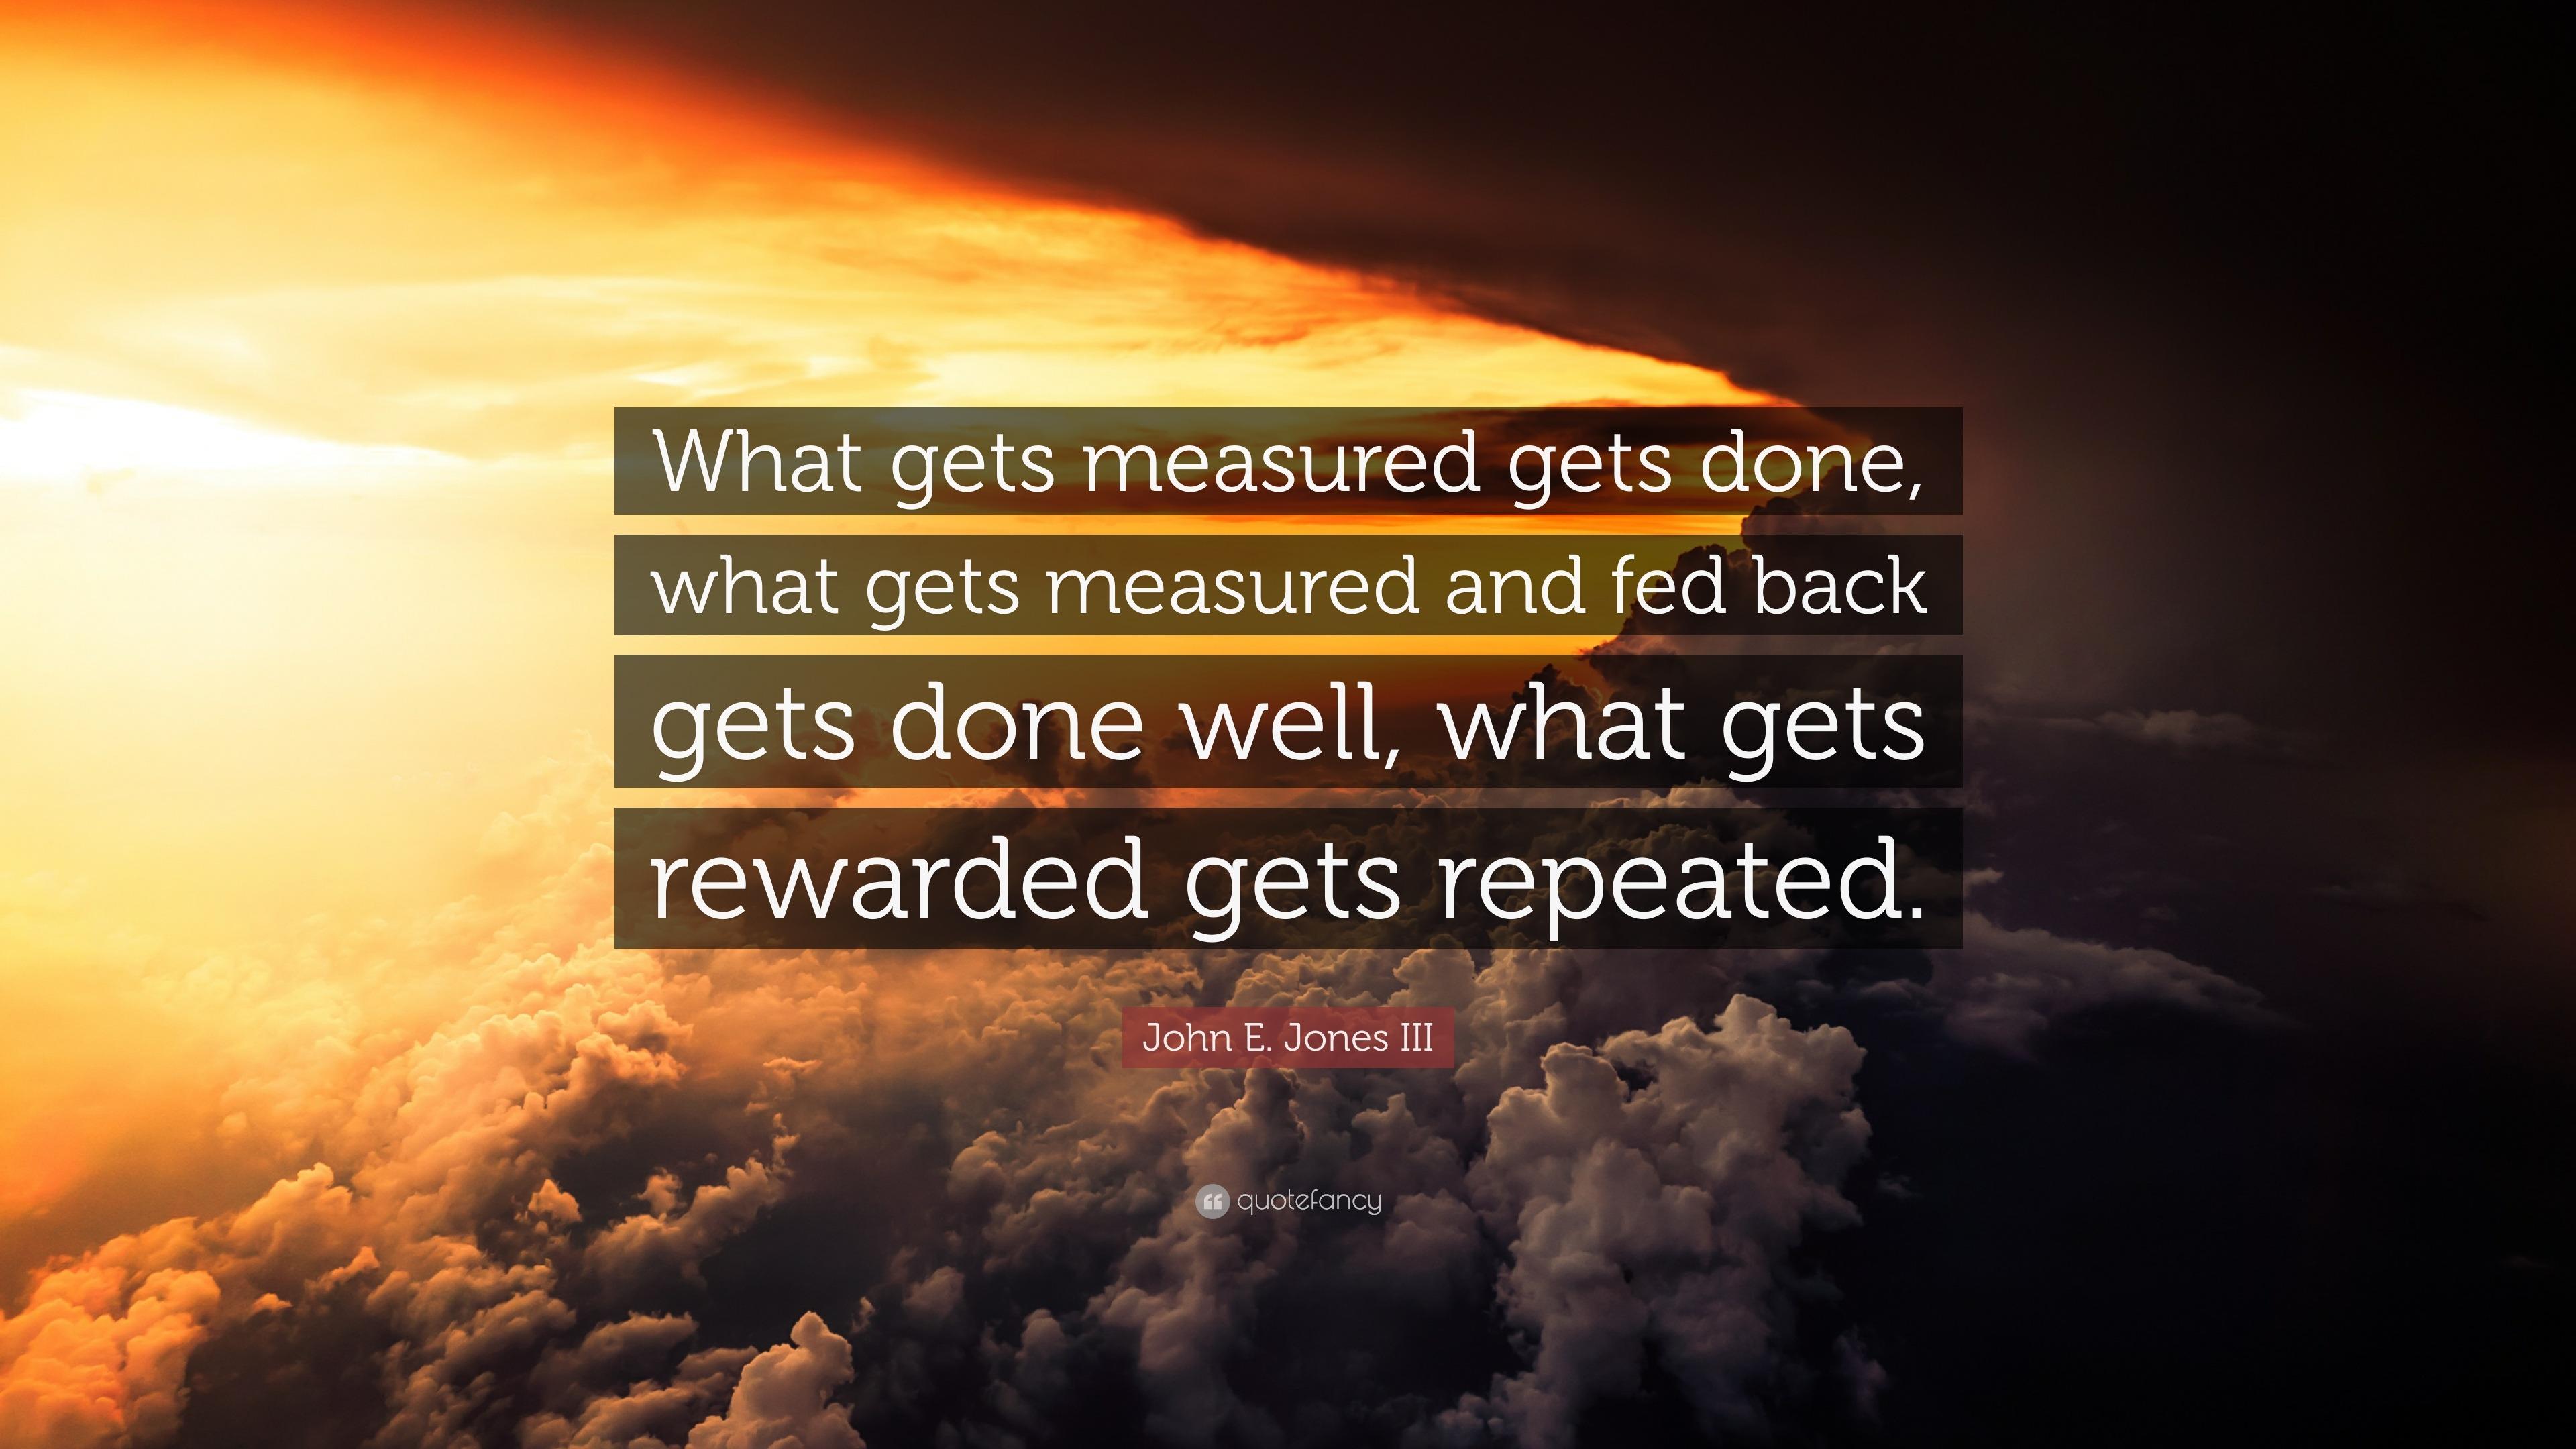 Swami Vivekananda Quotes Wallpaper John E Jones Iii Quote What Gets Measured Gets Done